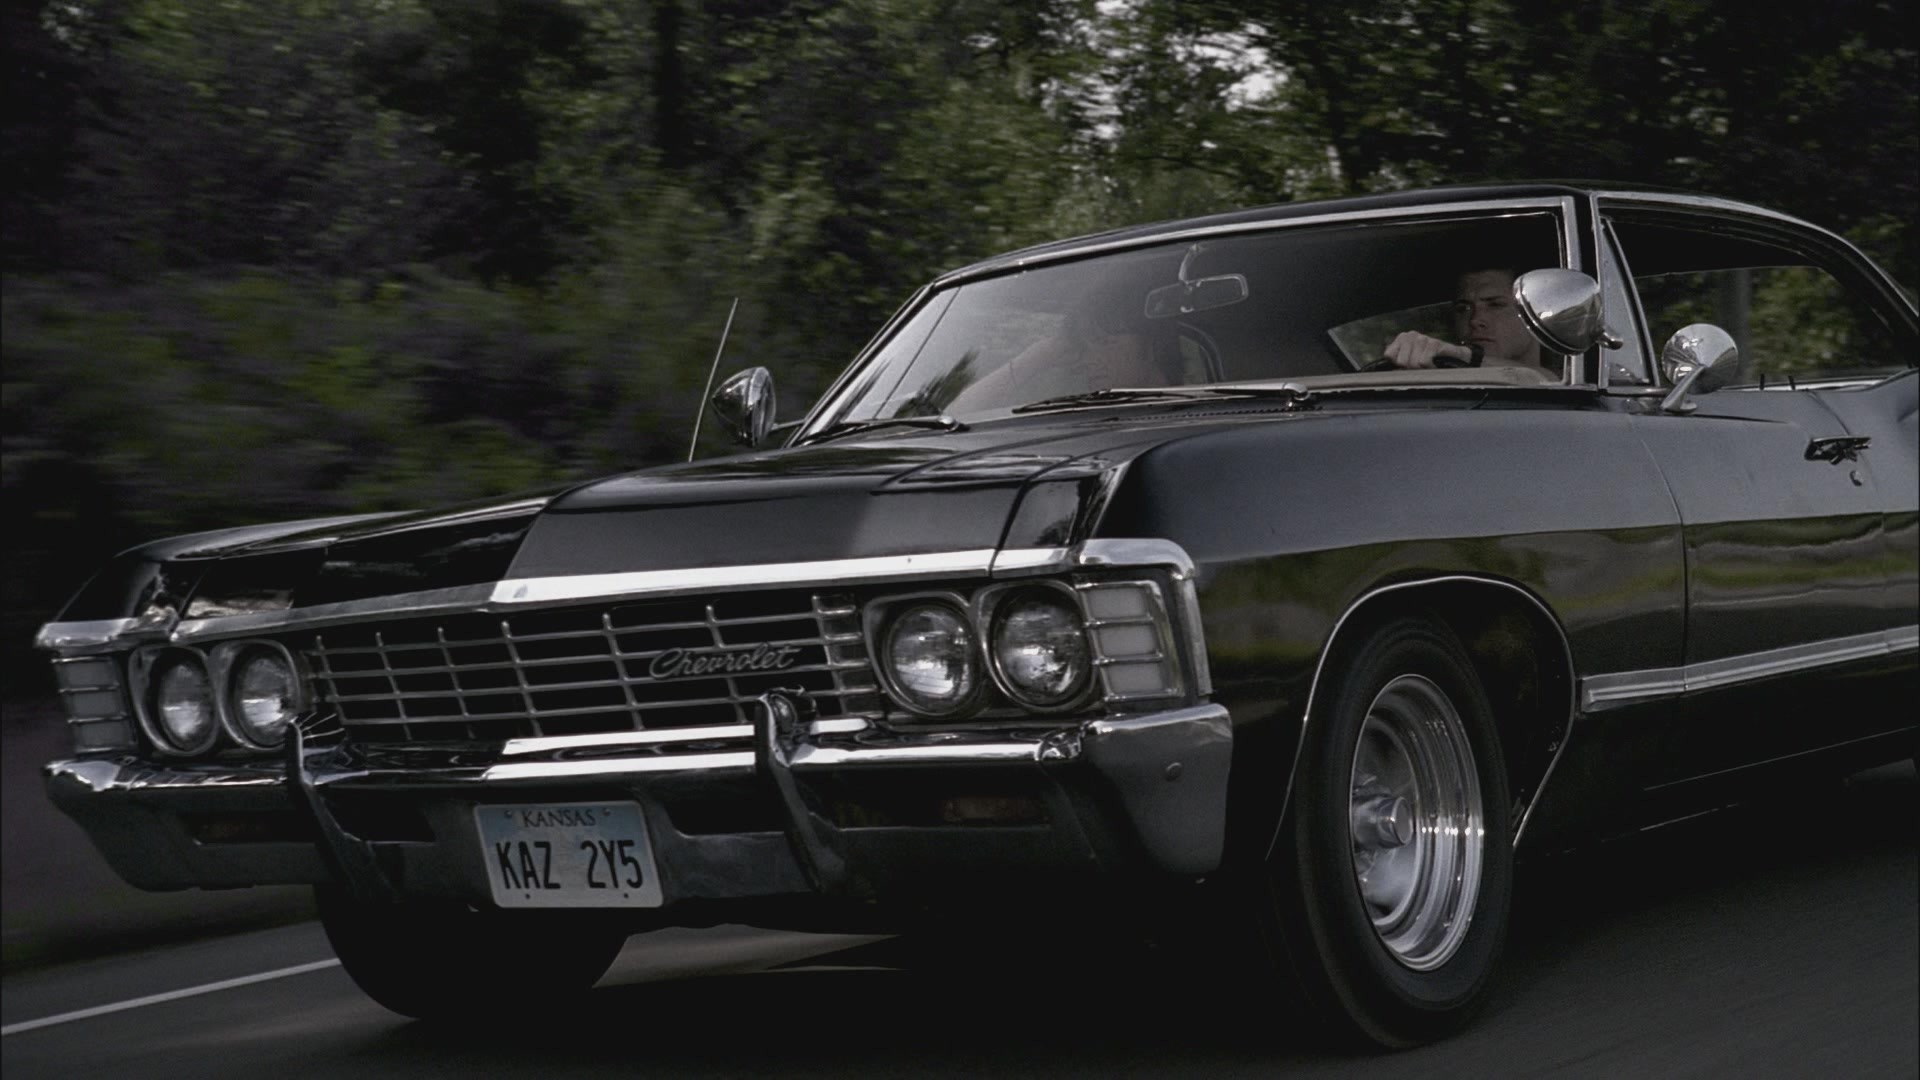 Supernatural Impala Wallpaper File:spn 0043 (impala).jpg